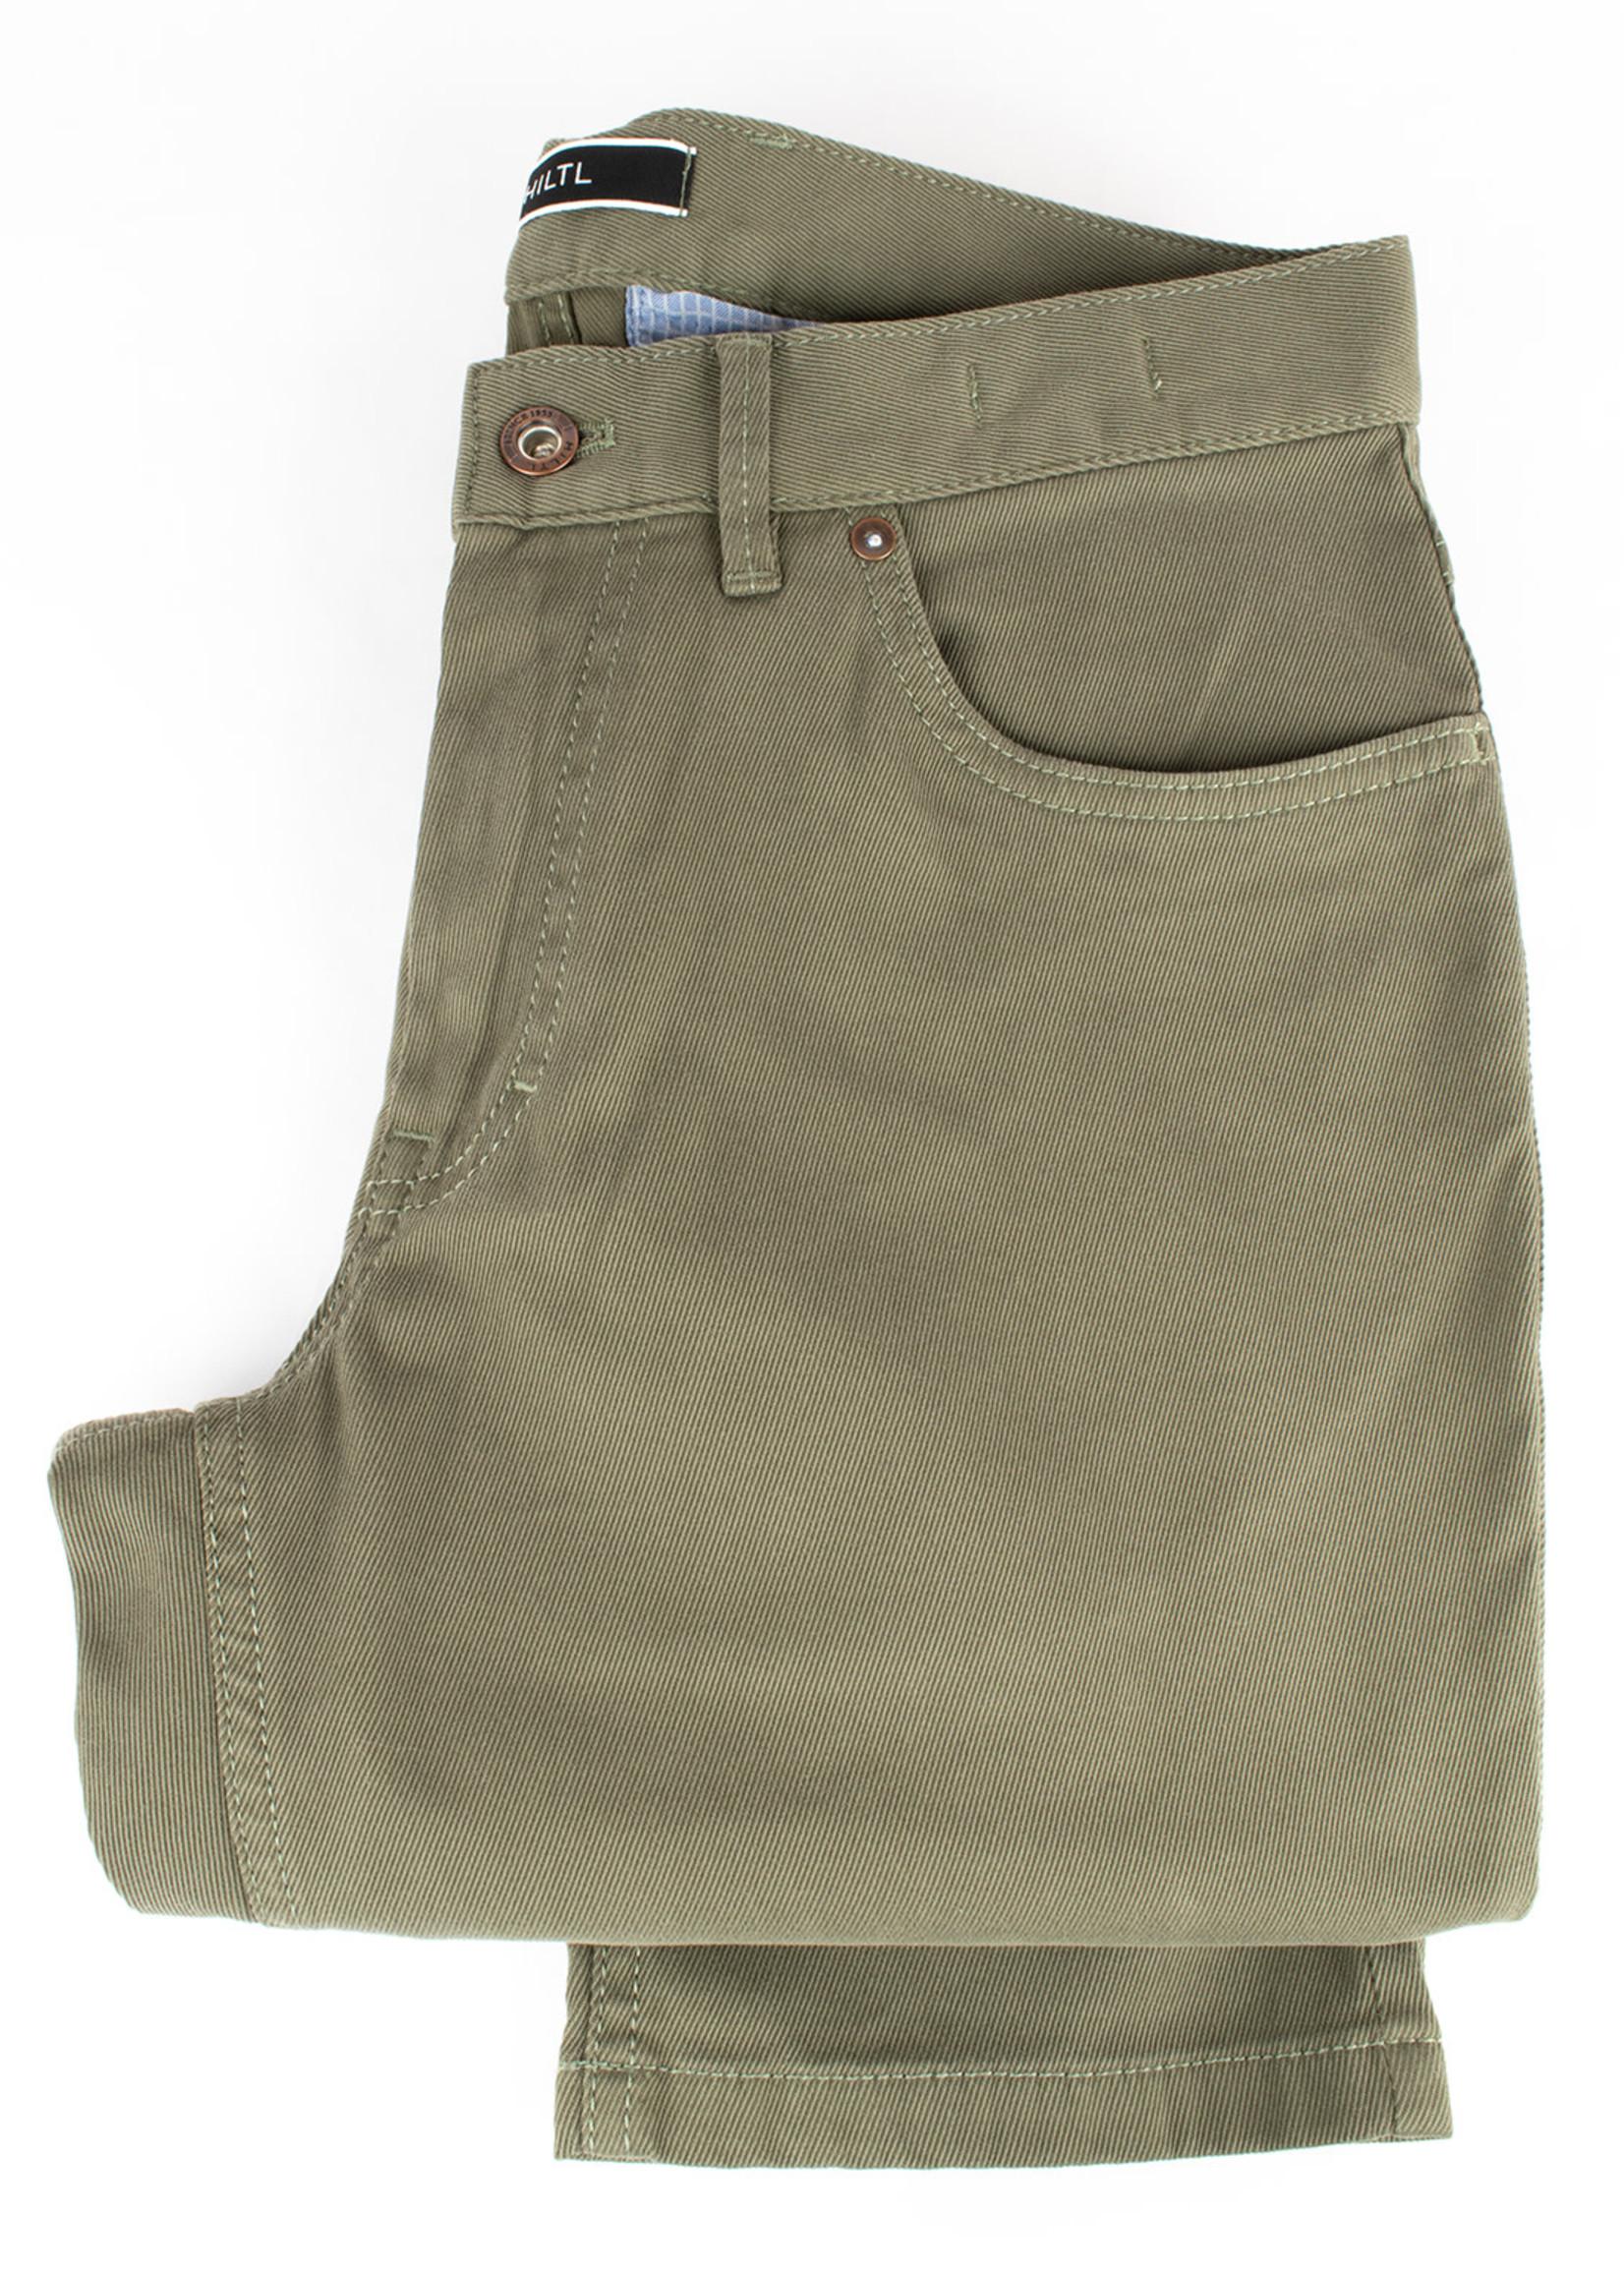 Hiltl Dude 5 Pocket Pant Olive Cotton Twill by Hiltl